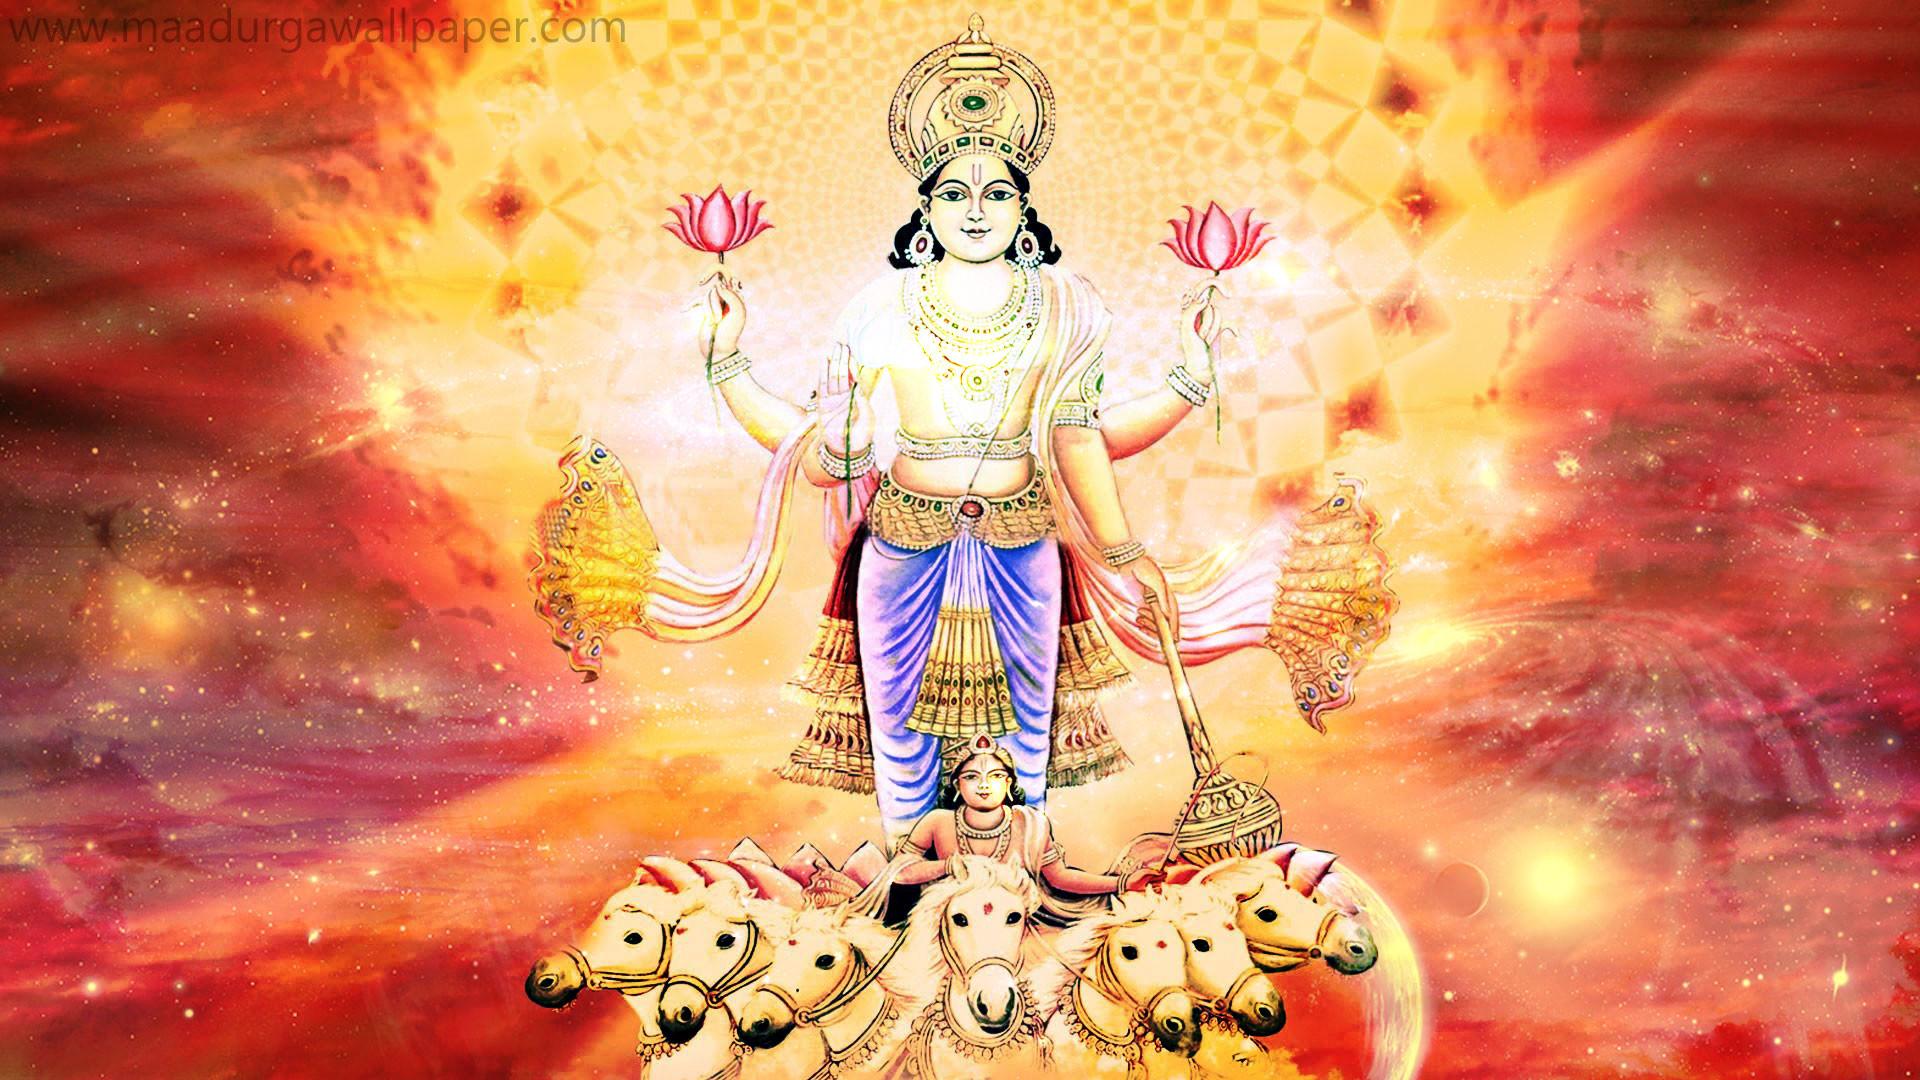 Lord murugan desktop wallpapers download labzada wallpaper full view download source lord murugan baby wallpapers for desktop fresh lord kartikeya hd thecheapjerseys Images